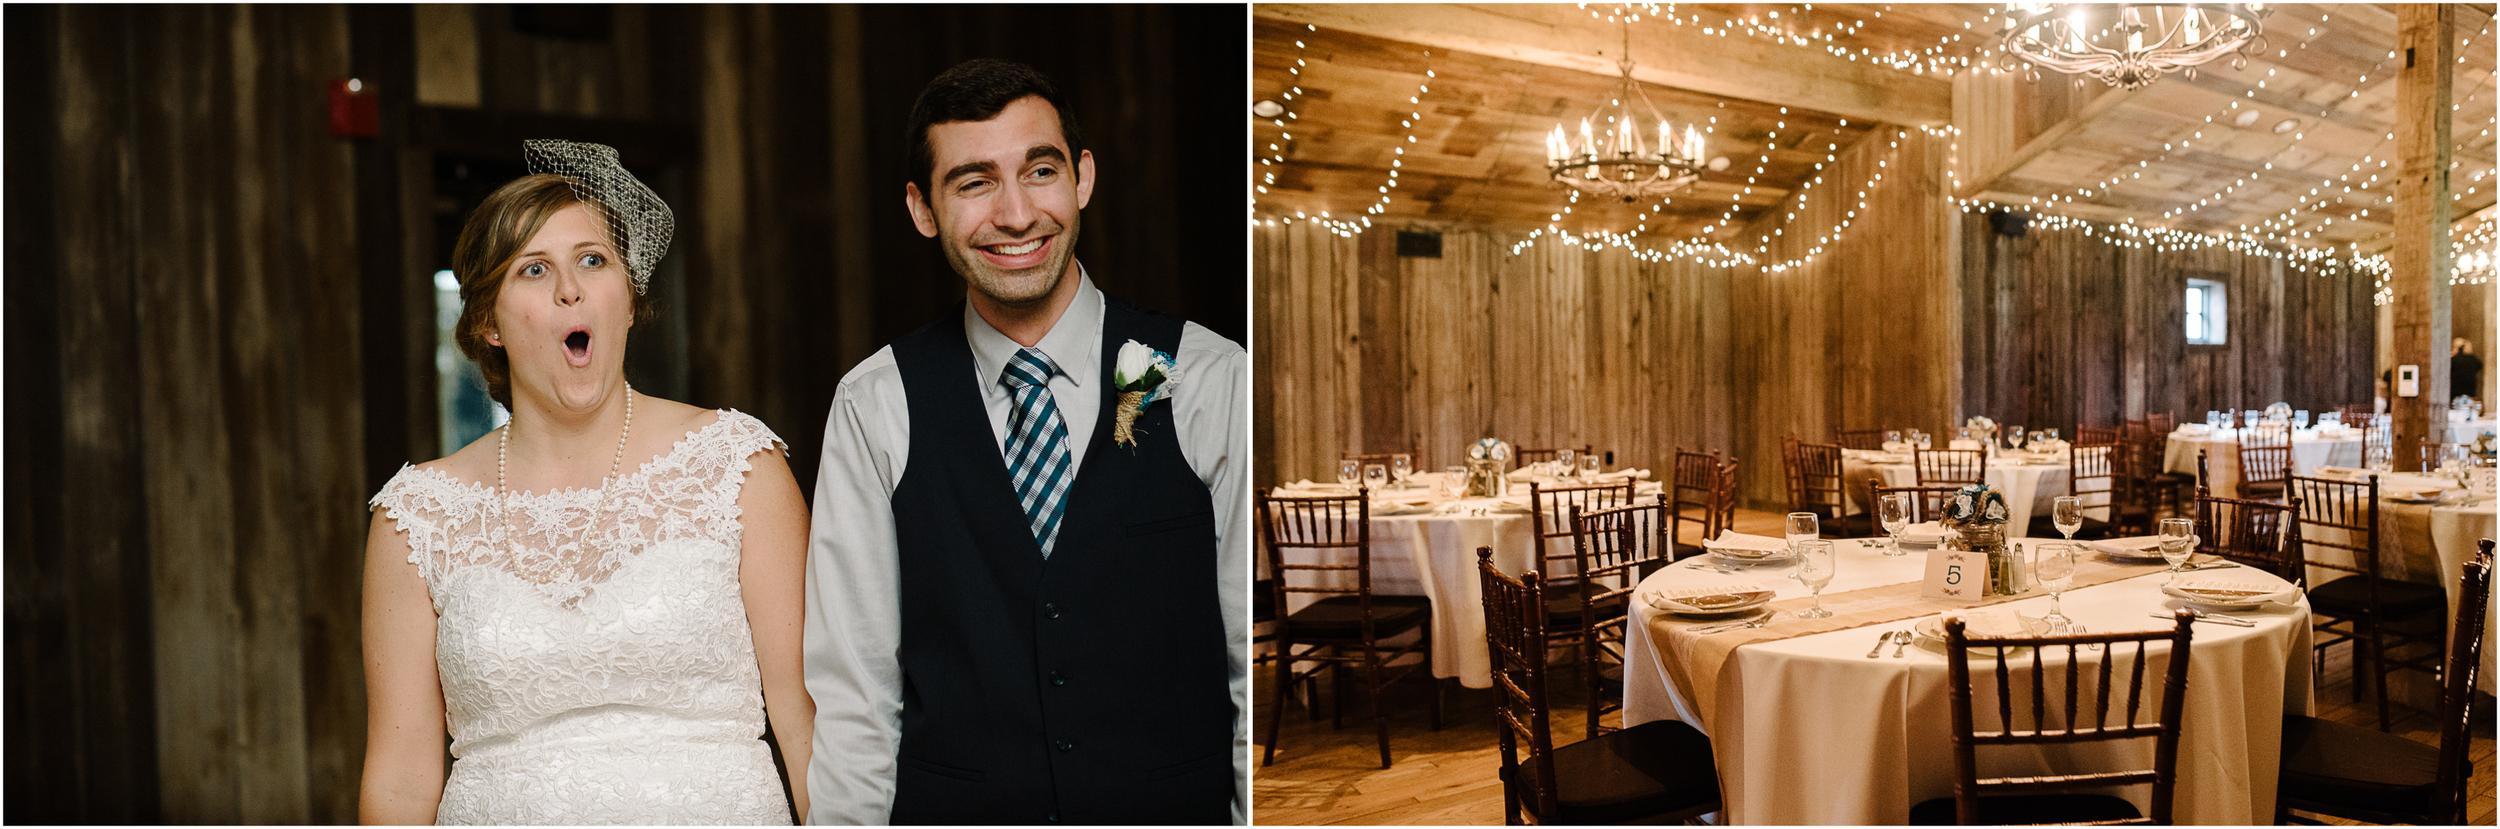 oak lodge wedding ligonier pennsylvania photographer.jpg